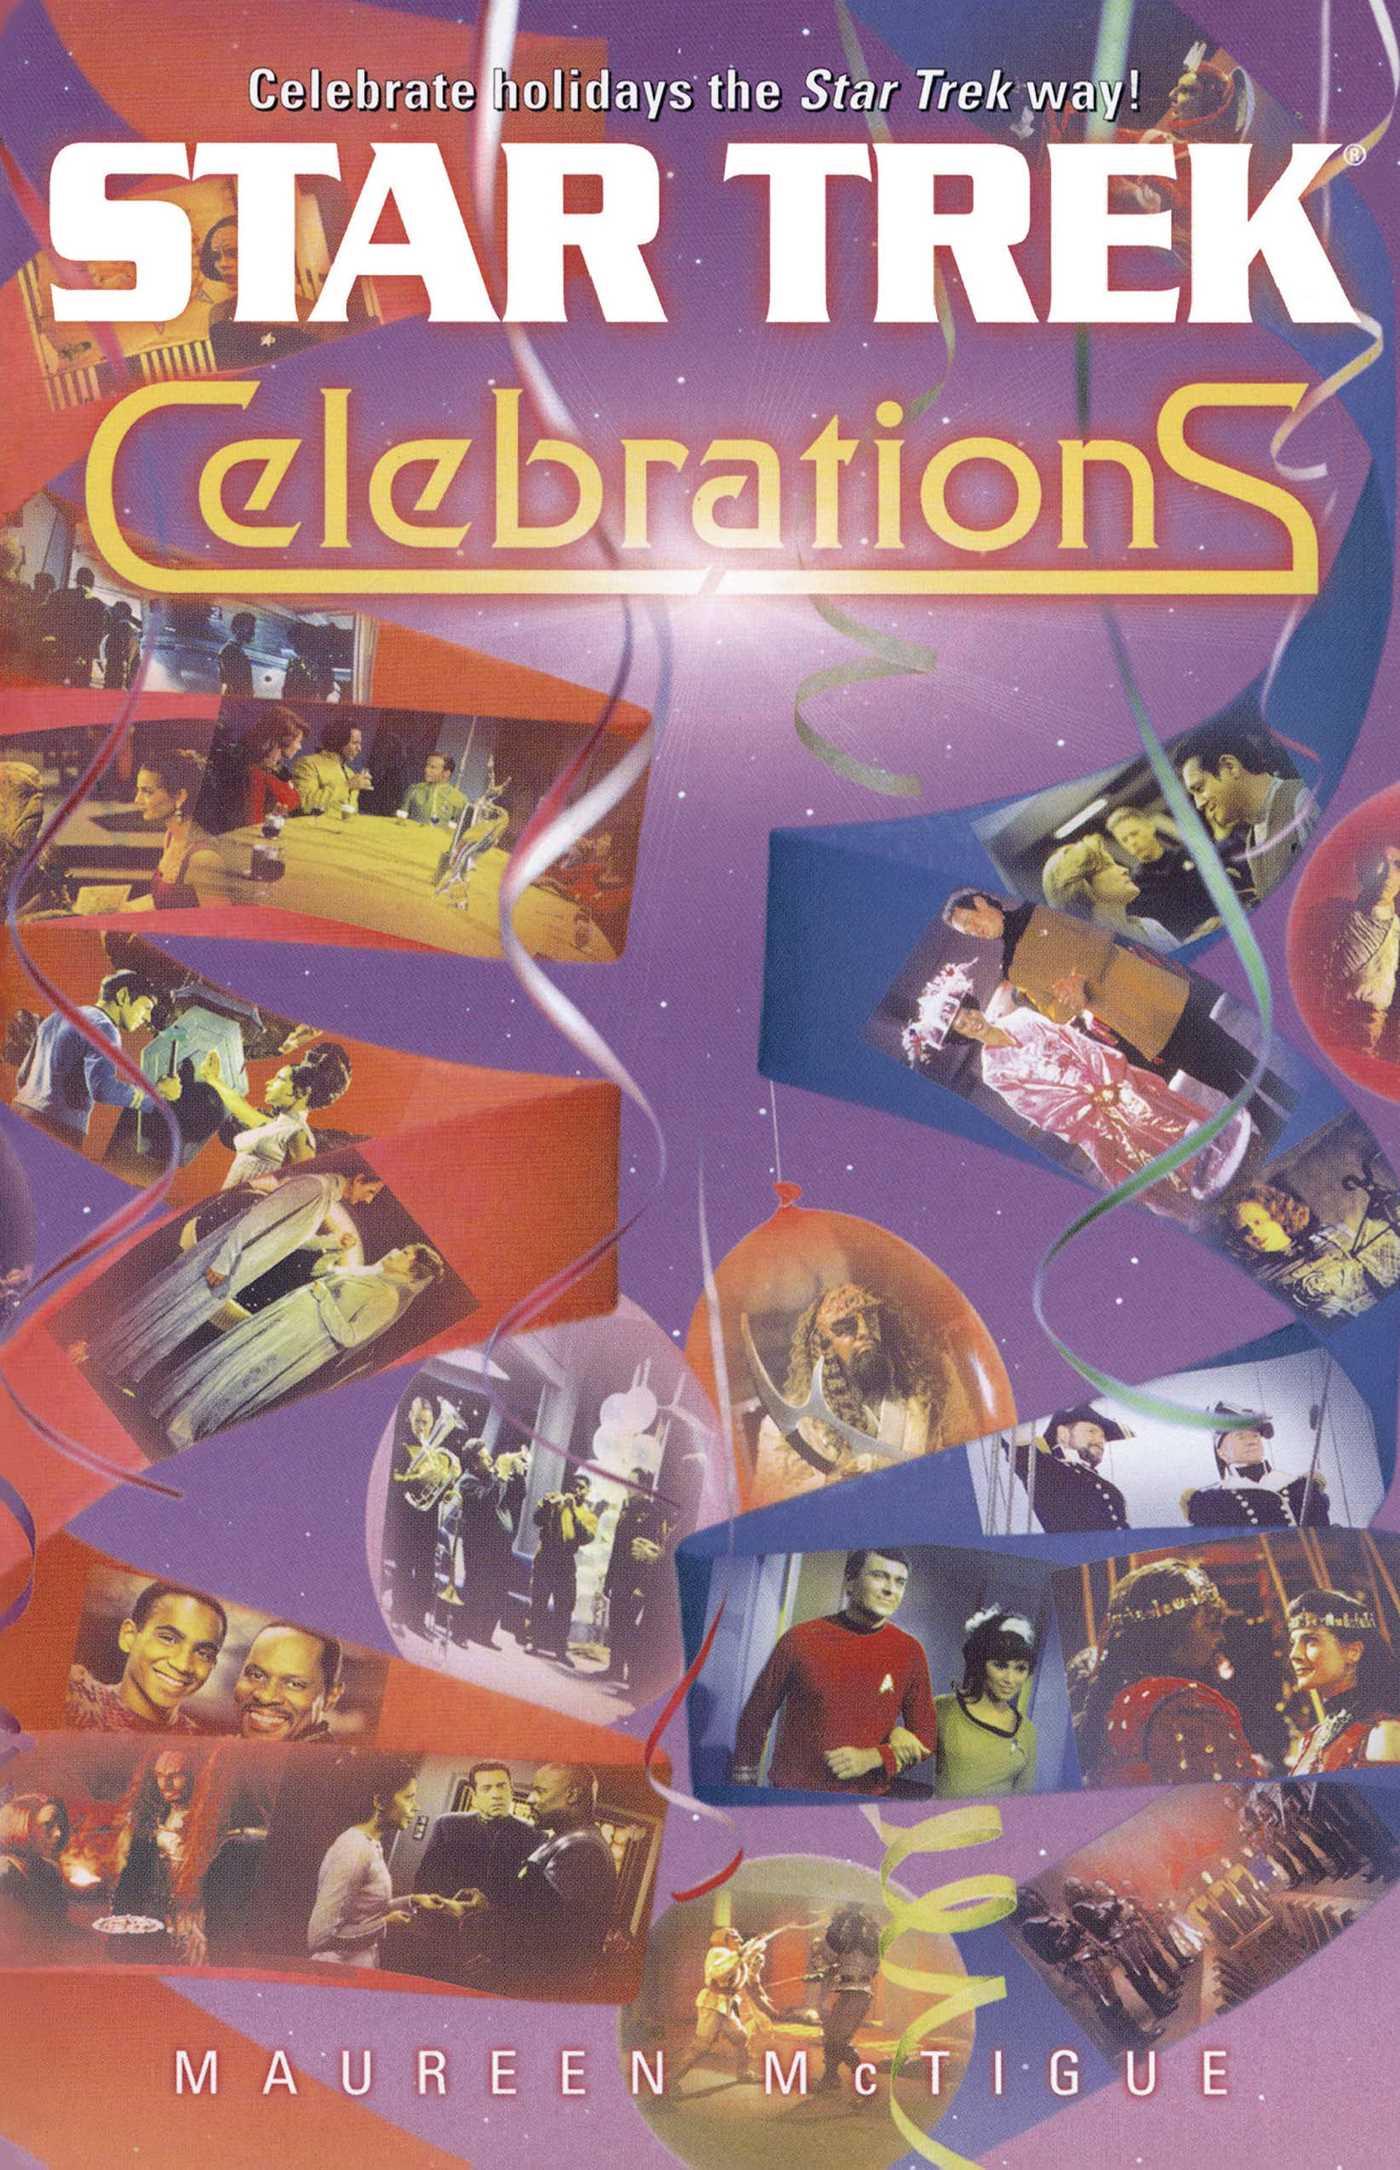 Celebrations 9780743453530 hr